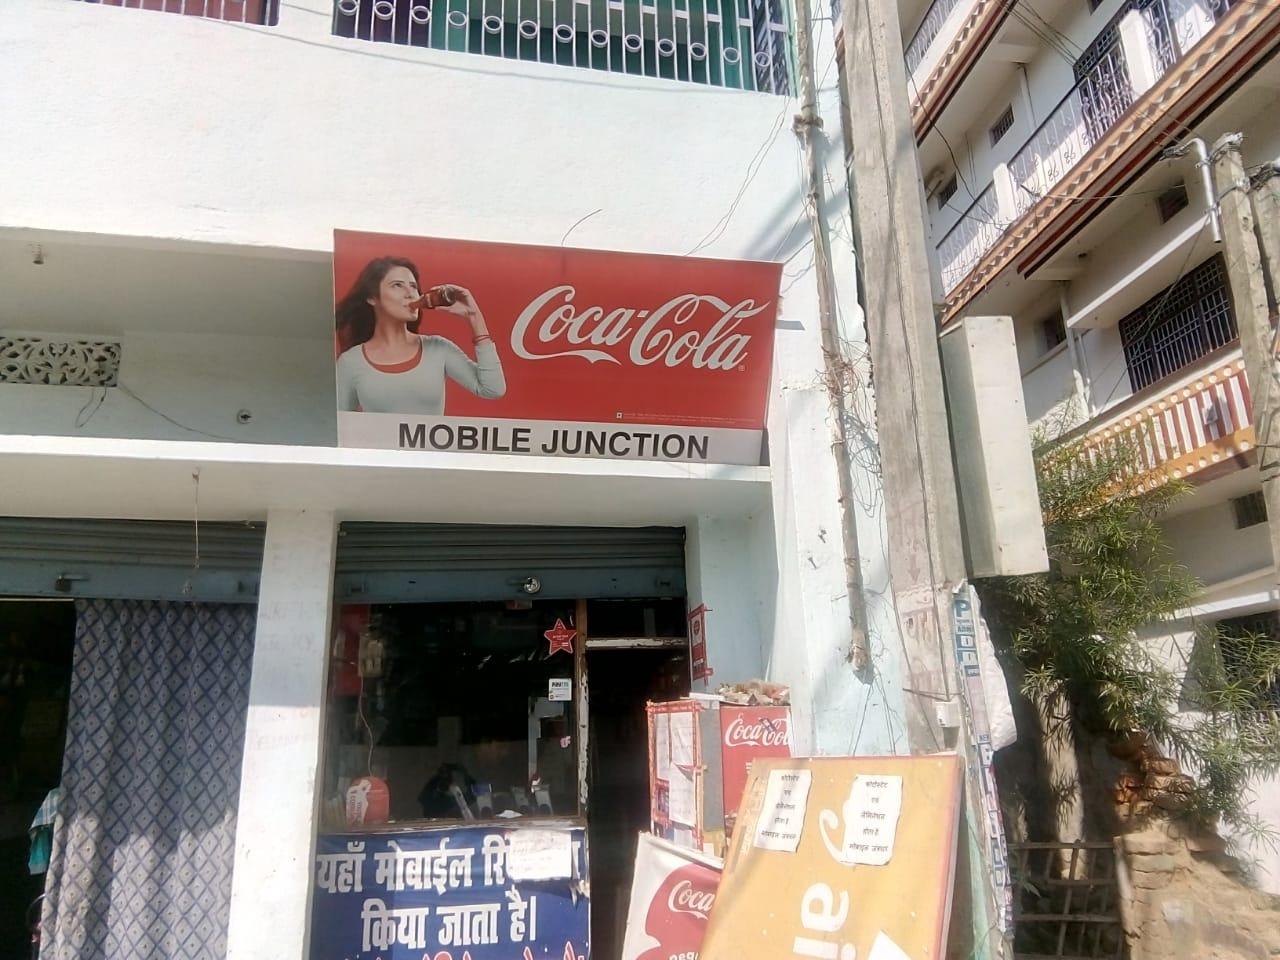 Mobile-Junction-1